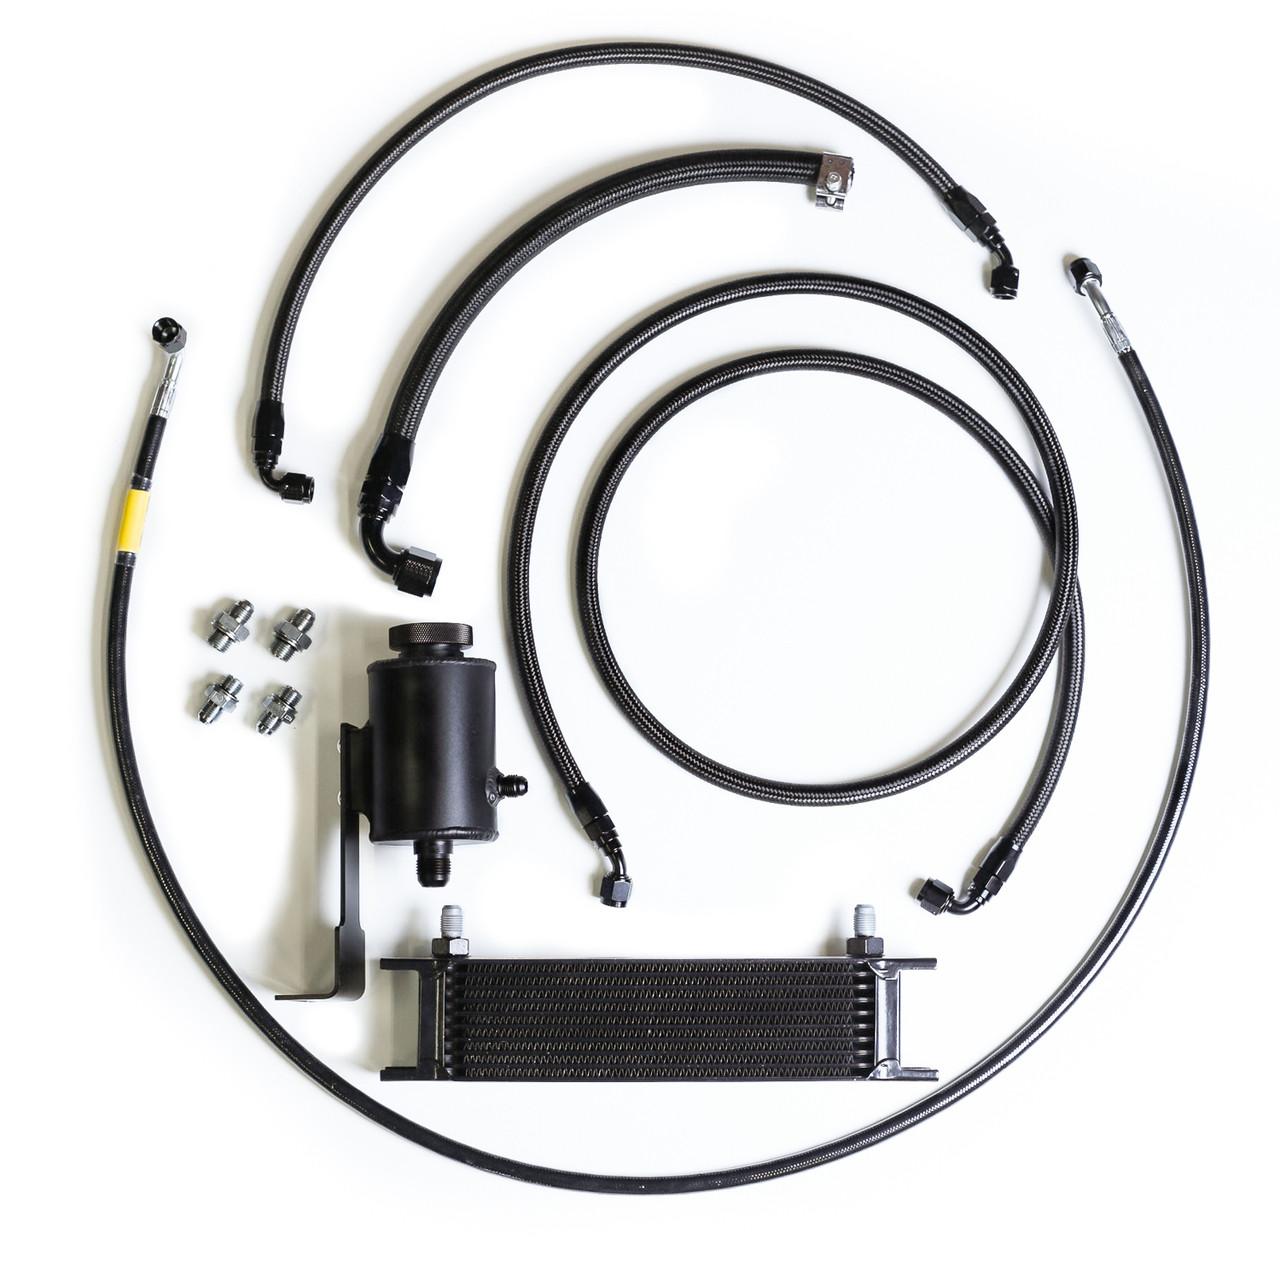 Brake caliper repair decal sticker fit Subaru WRX rally car wrx x2 Rear 60mm x2